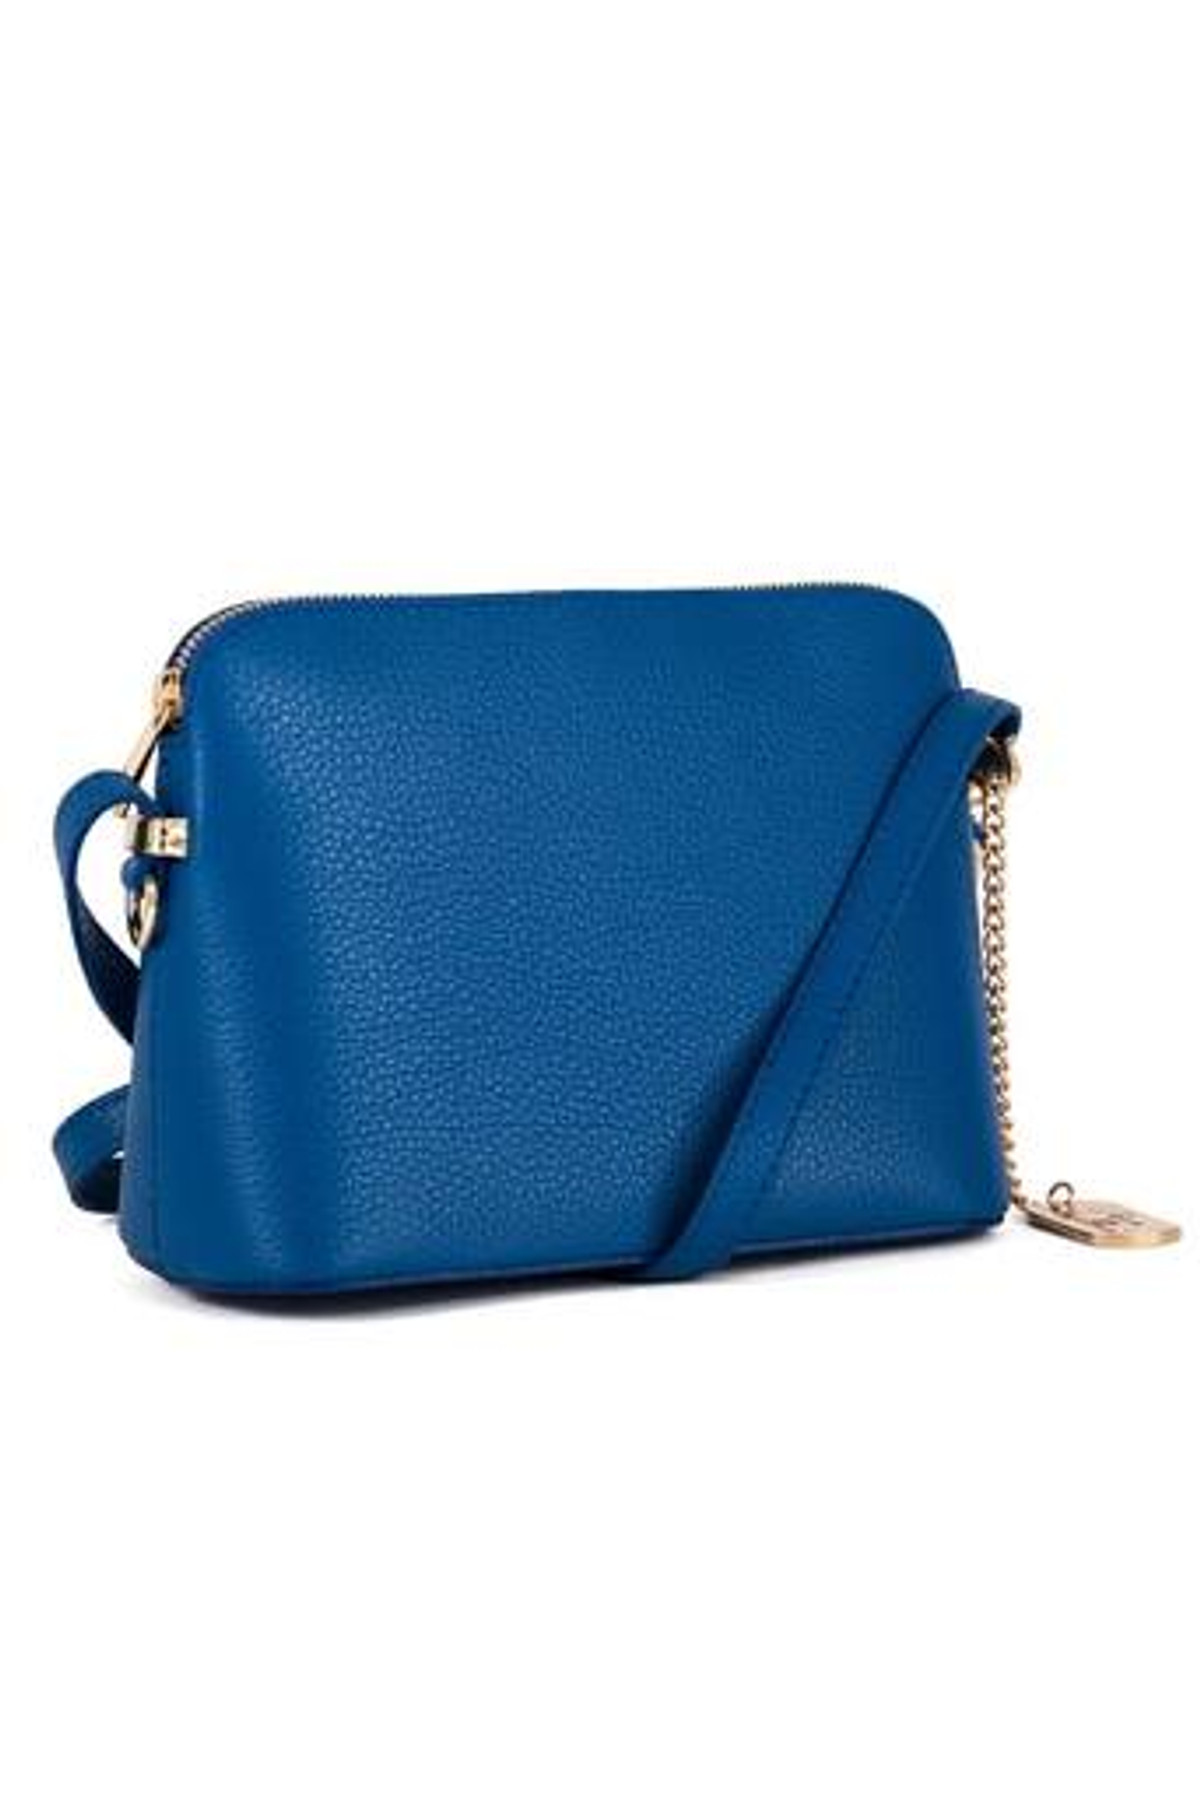 ANNA MORELLINI Sofia Leather Bag made in Italy WB113342